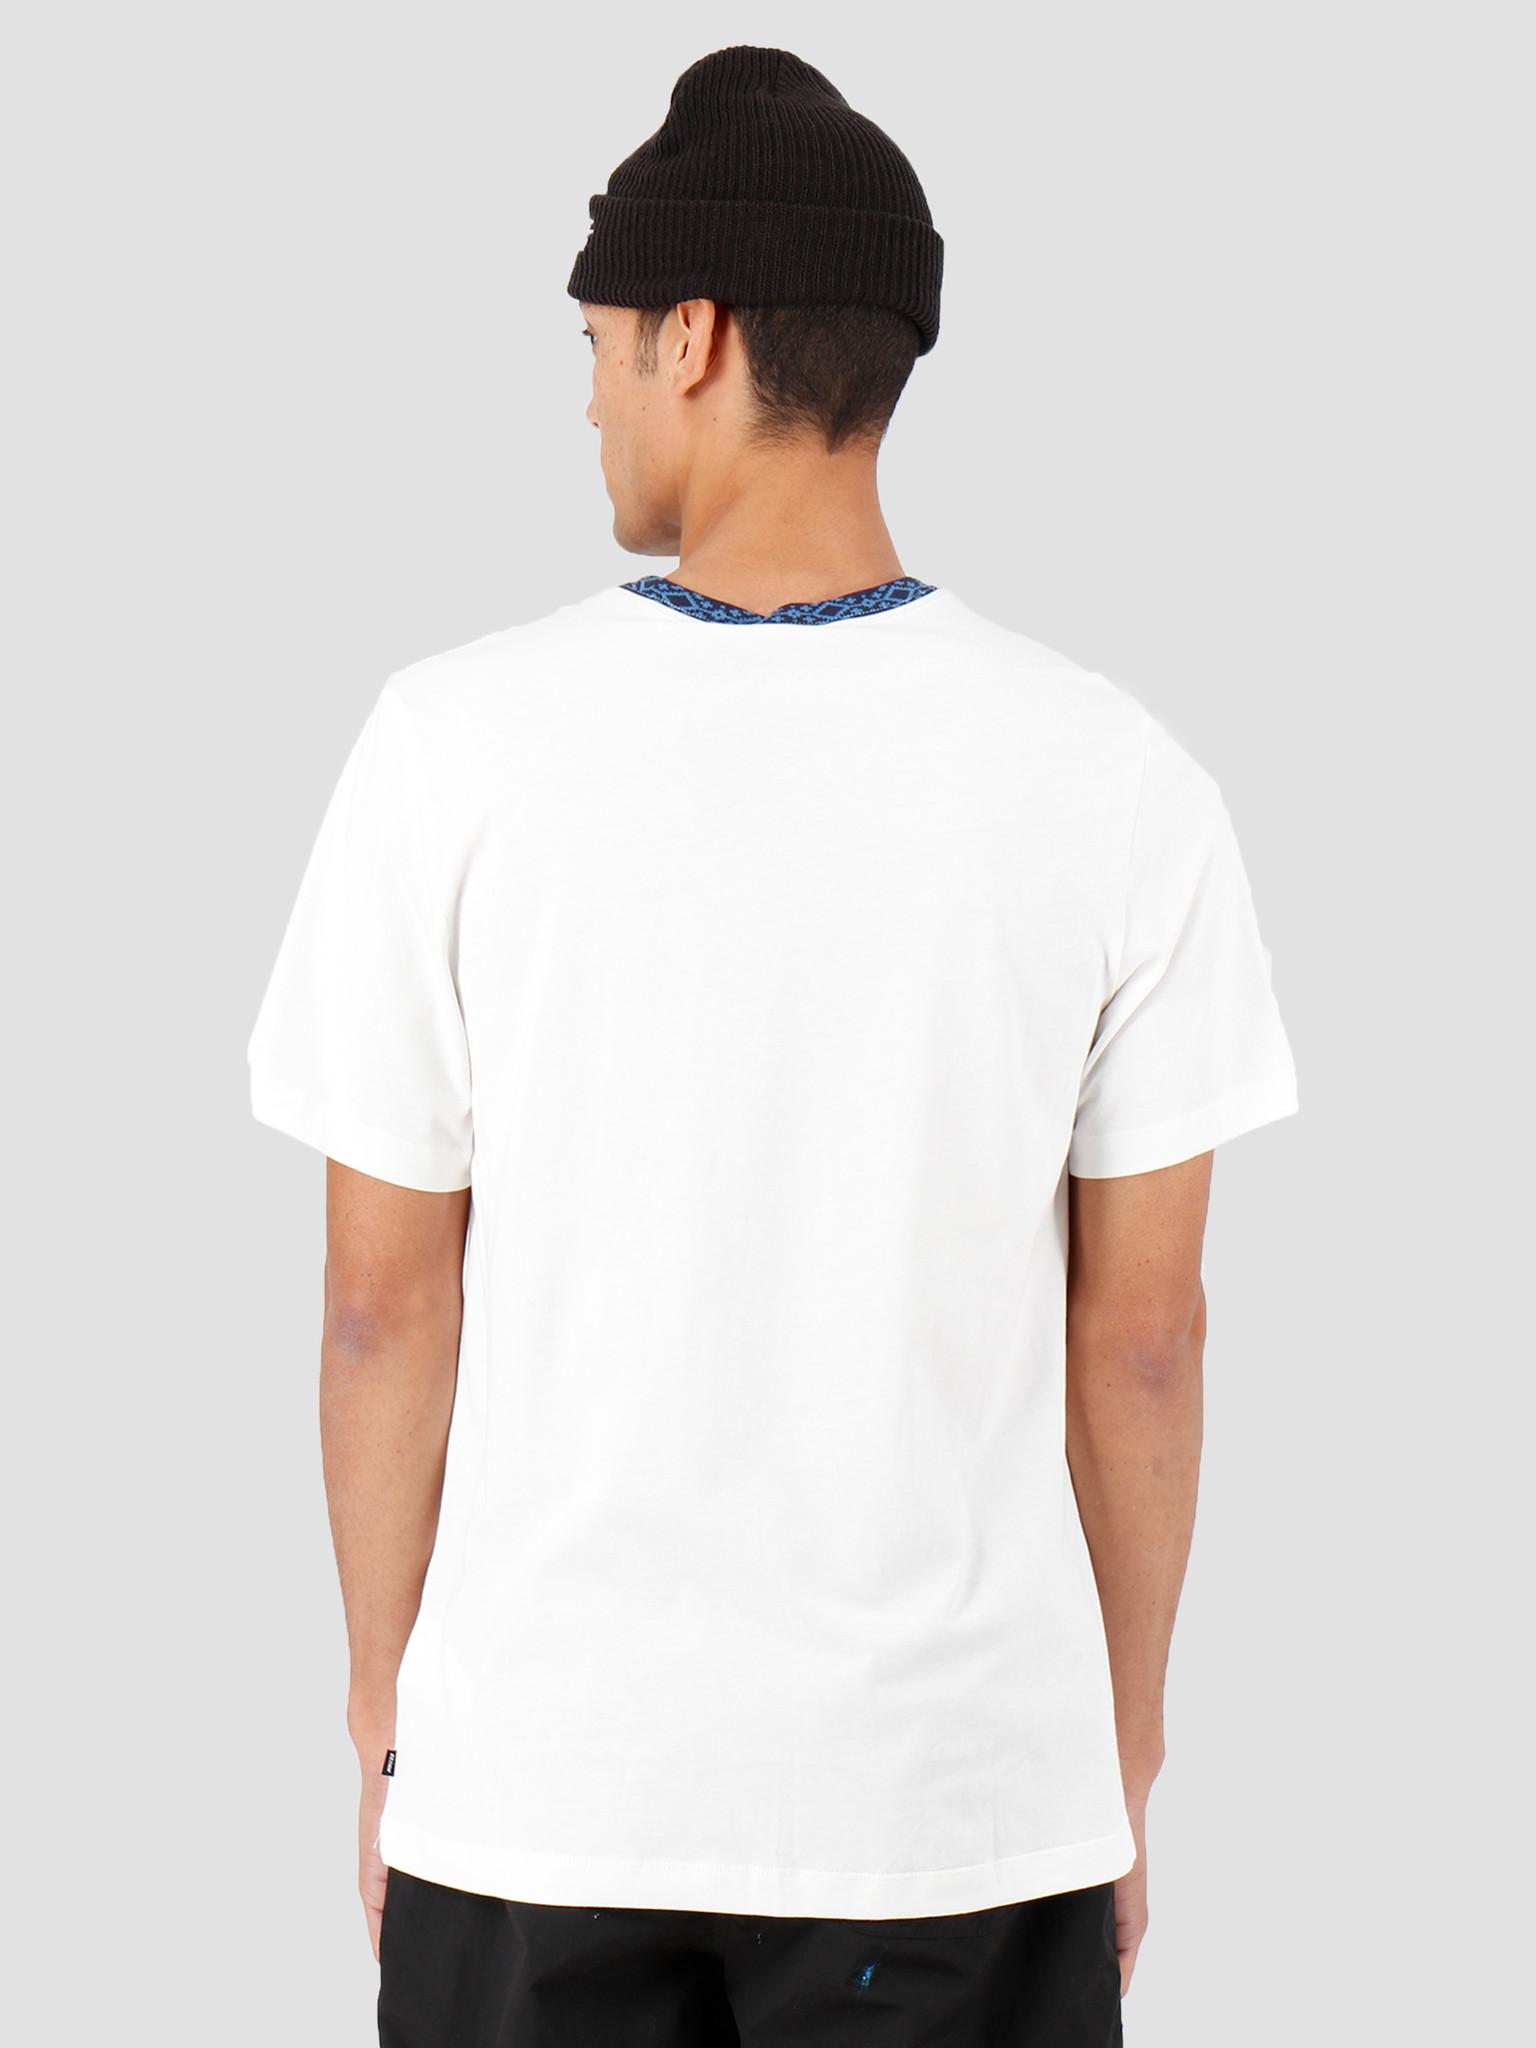 Nike Nike SB T-Shirt Sail Obsidian Bright CriMSon Cj0454-133